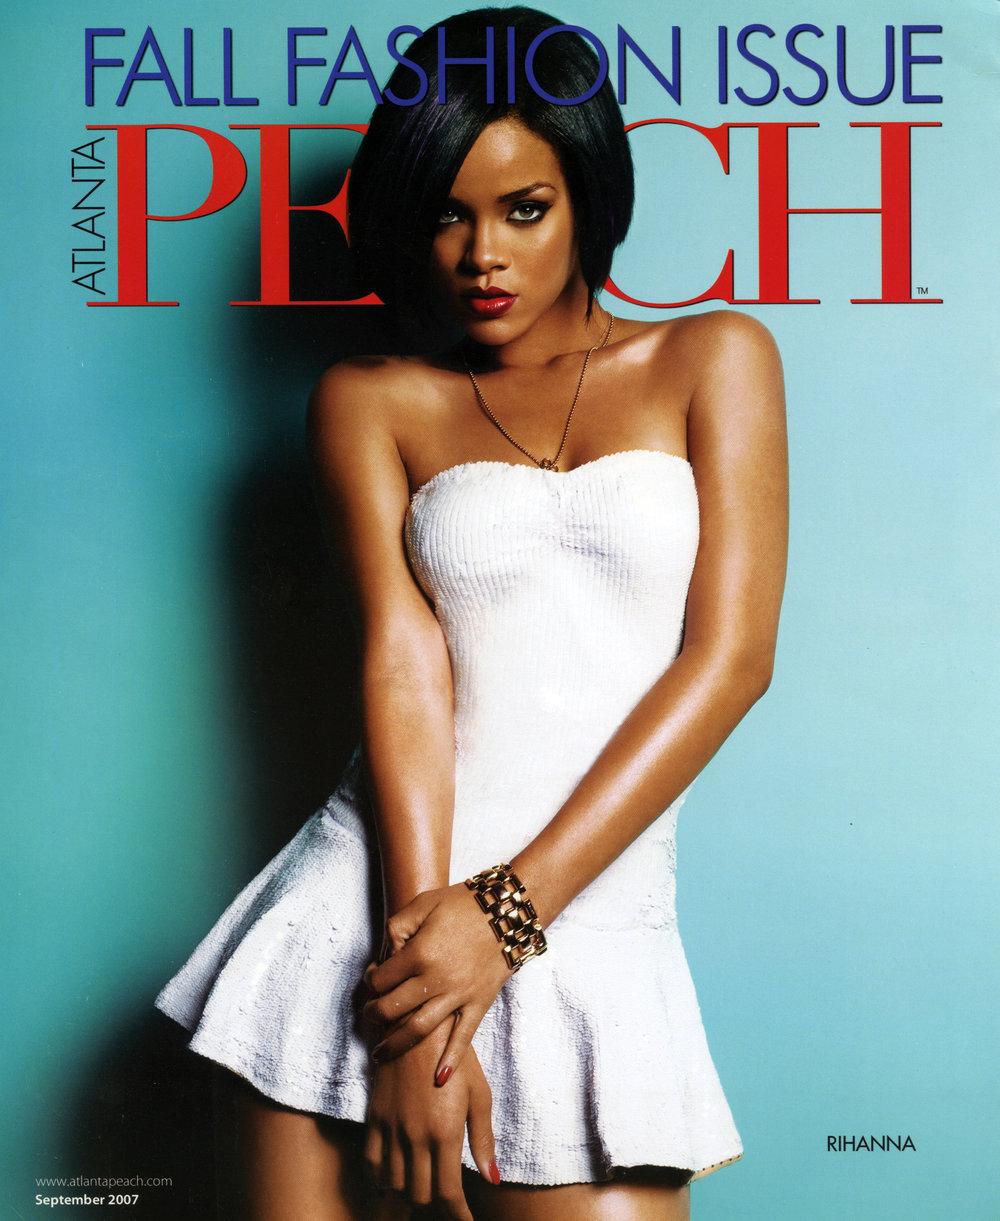 Guiseppe Rihanna 2.jpeg